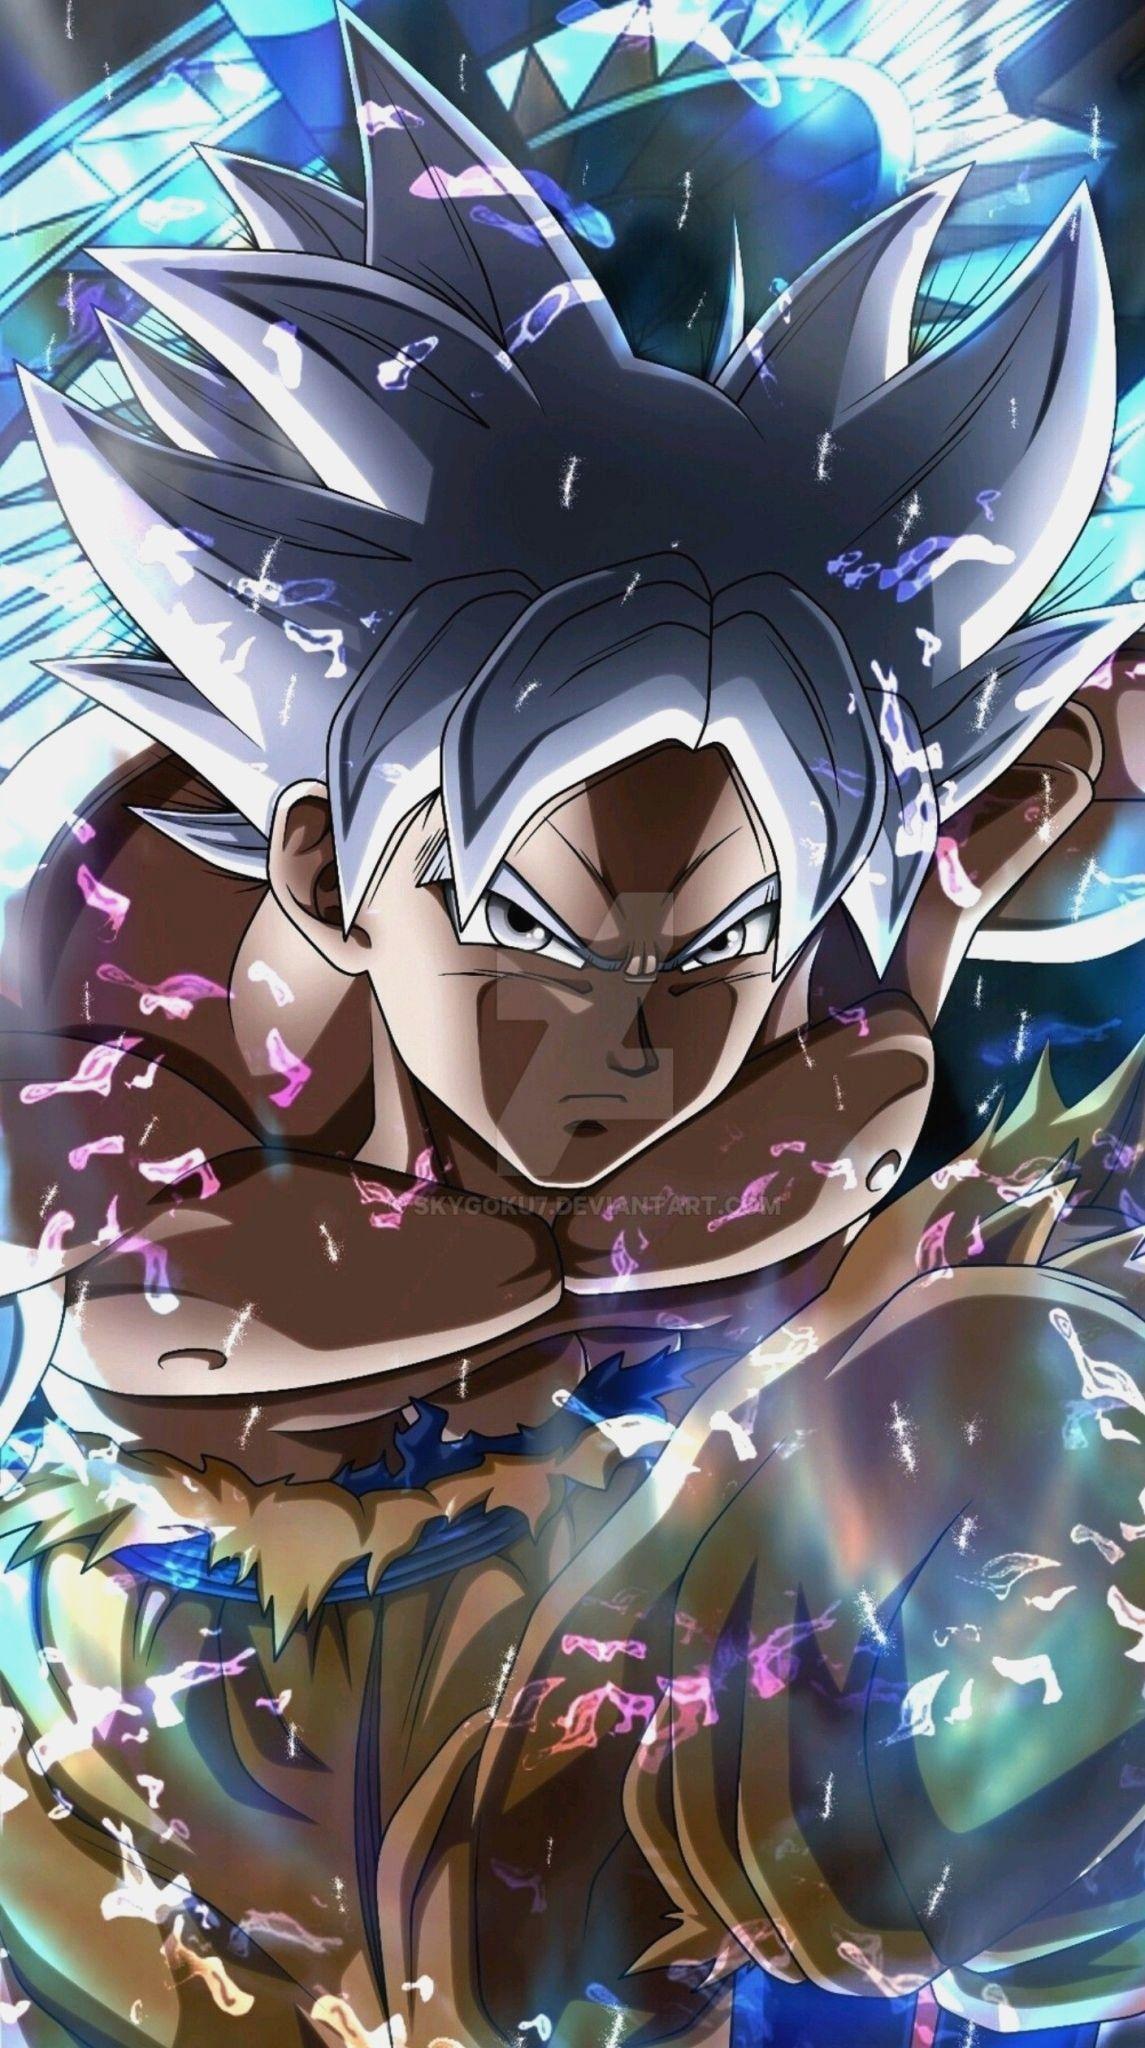 Anime 3d Live Wallpaper Android gambar ke 19